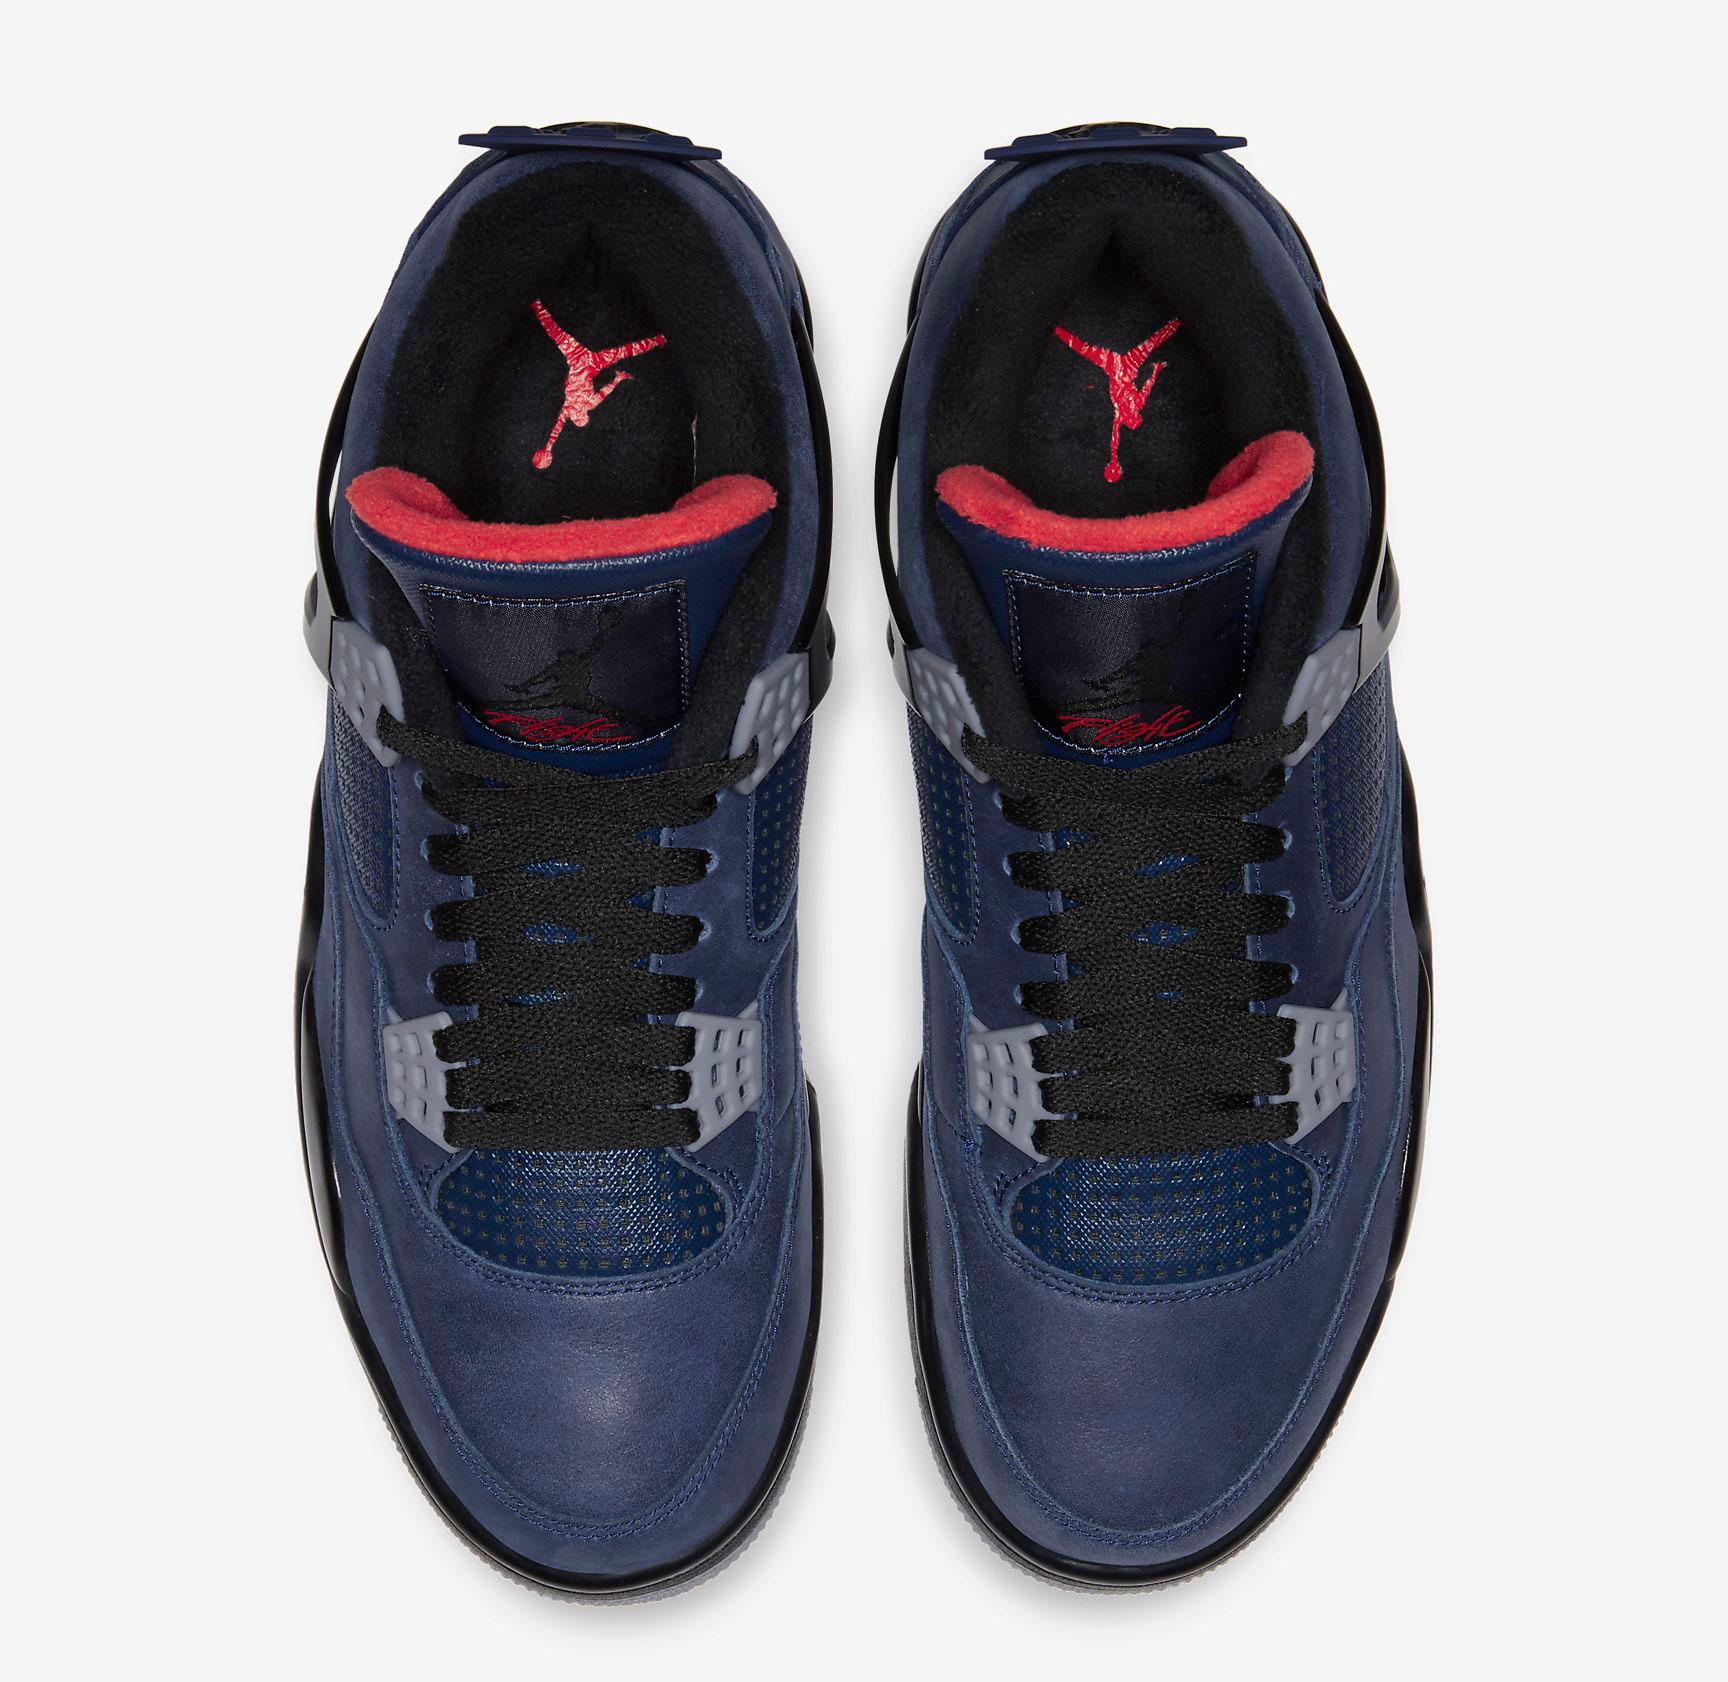 air-jordan-4-wntr-winter-loyal-blue-4